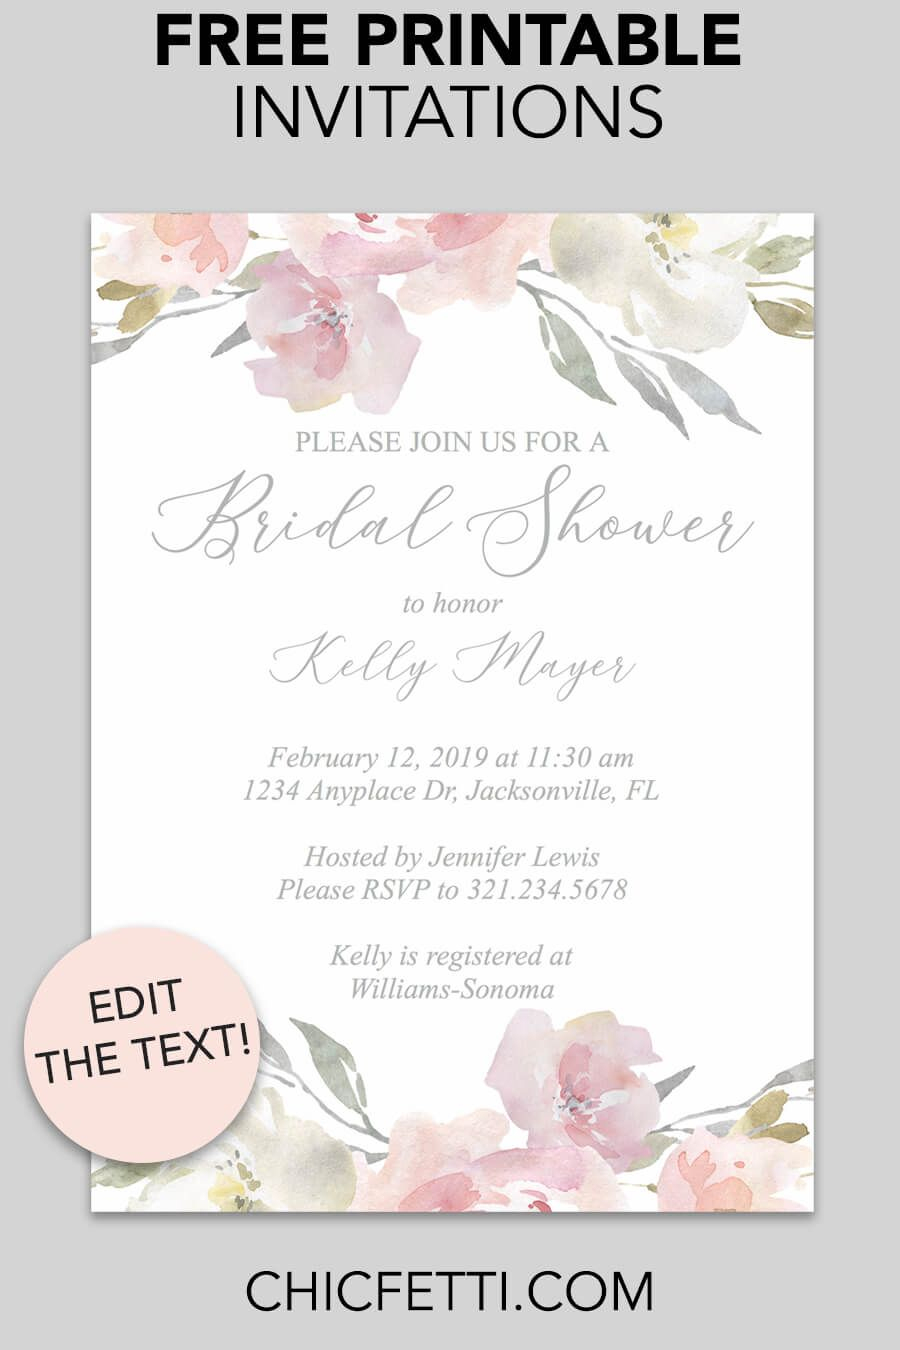 Bridal Shower Printable Invitation (Blush Floral   Invitations - Free Printable Bridal Shower Invitations Templates